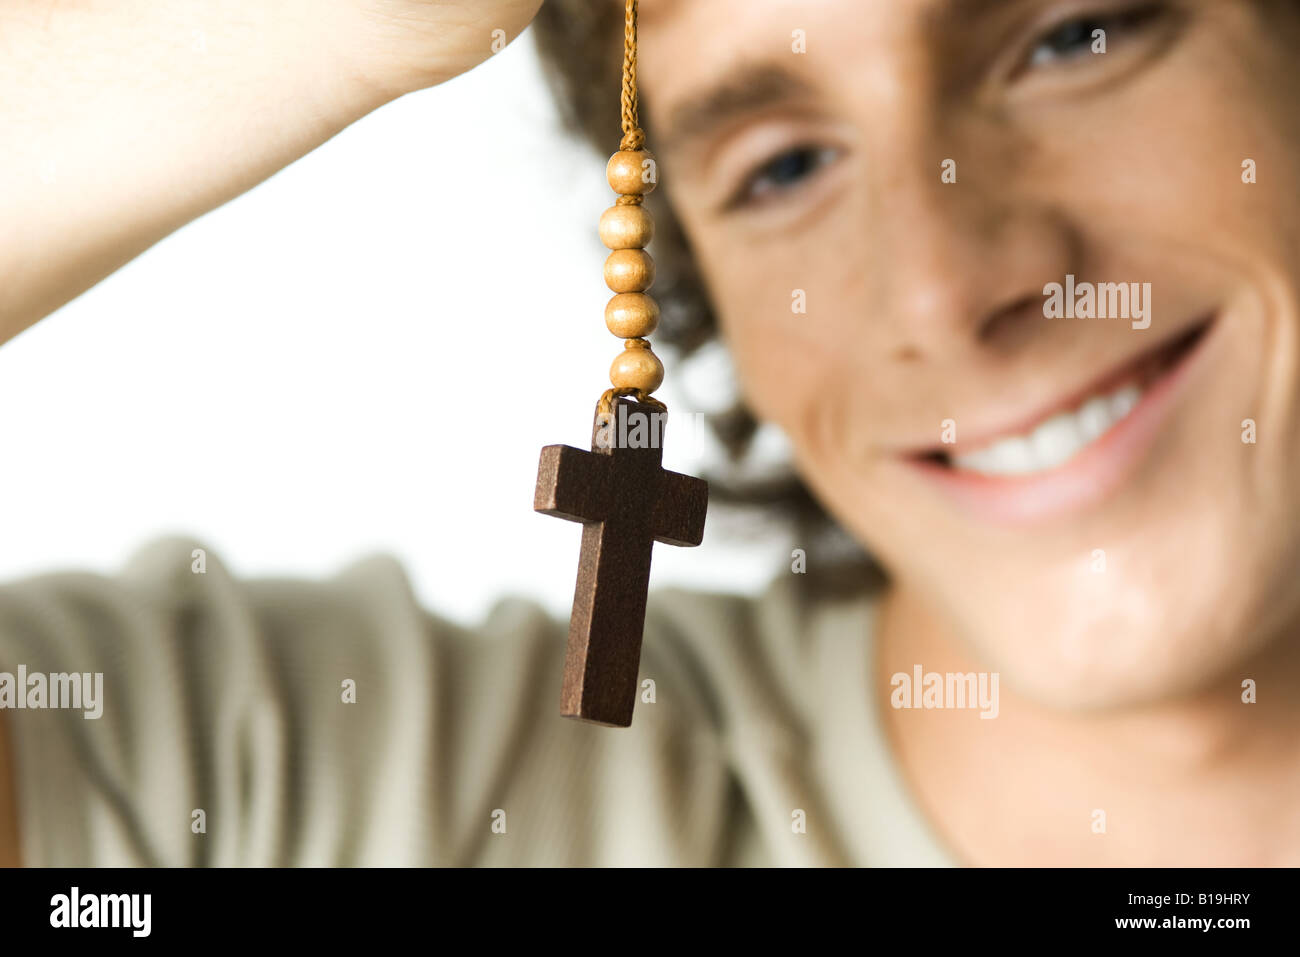 Young man looking at cross, smiling, close-up - Stock Image